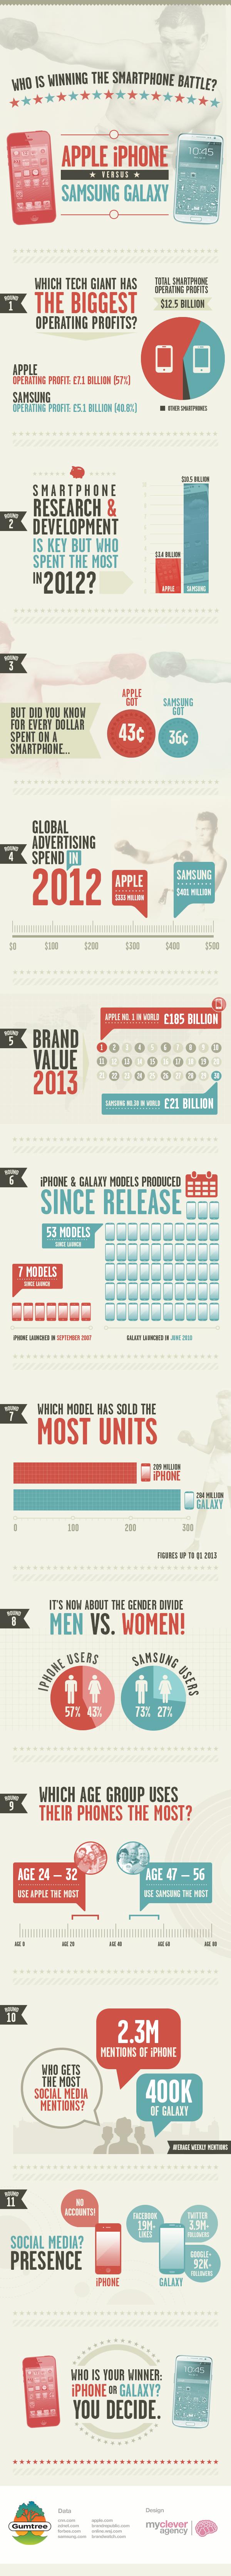 13. Gumtree-Infographic-iPhone-vs-galaxy